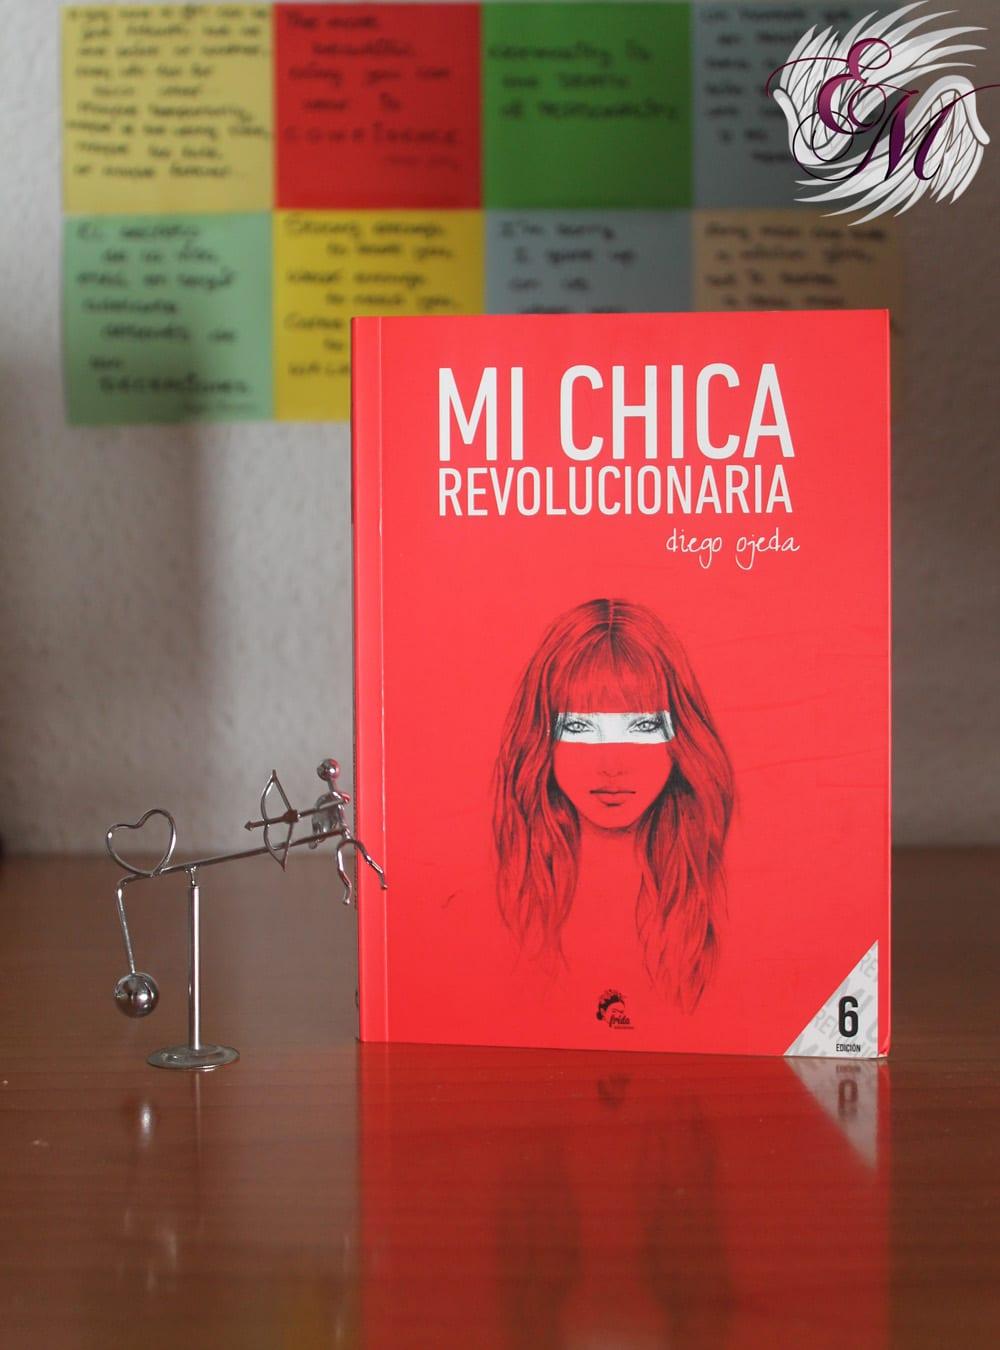 Mi chica revolucionaria, de Diego Ojeda – Reseña